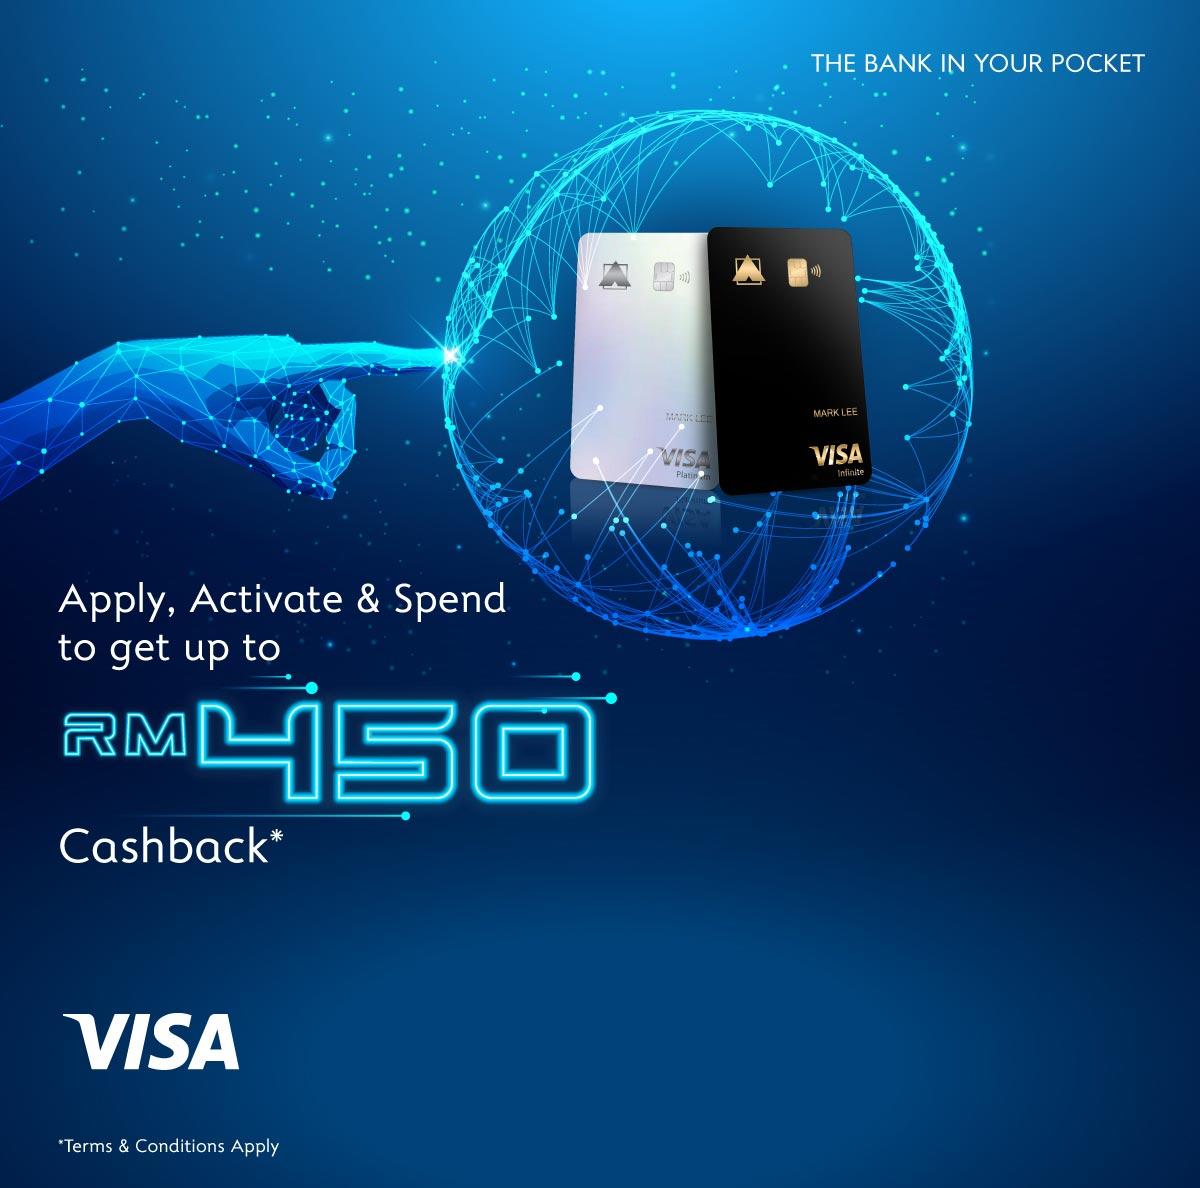 RM450 Cashback Campaign